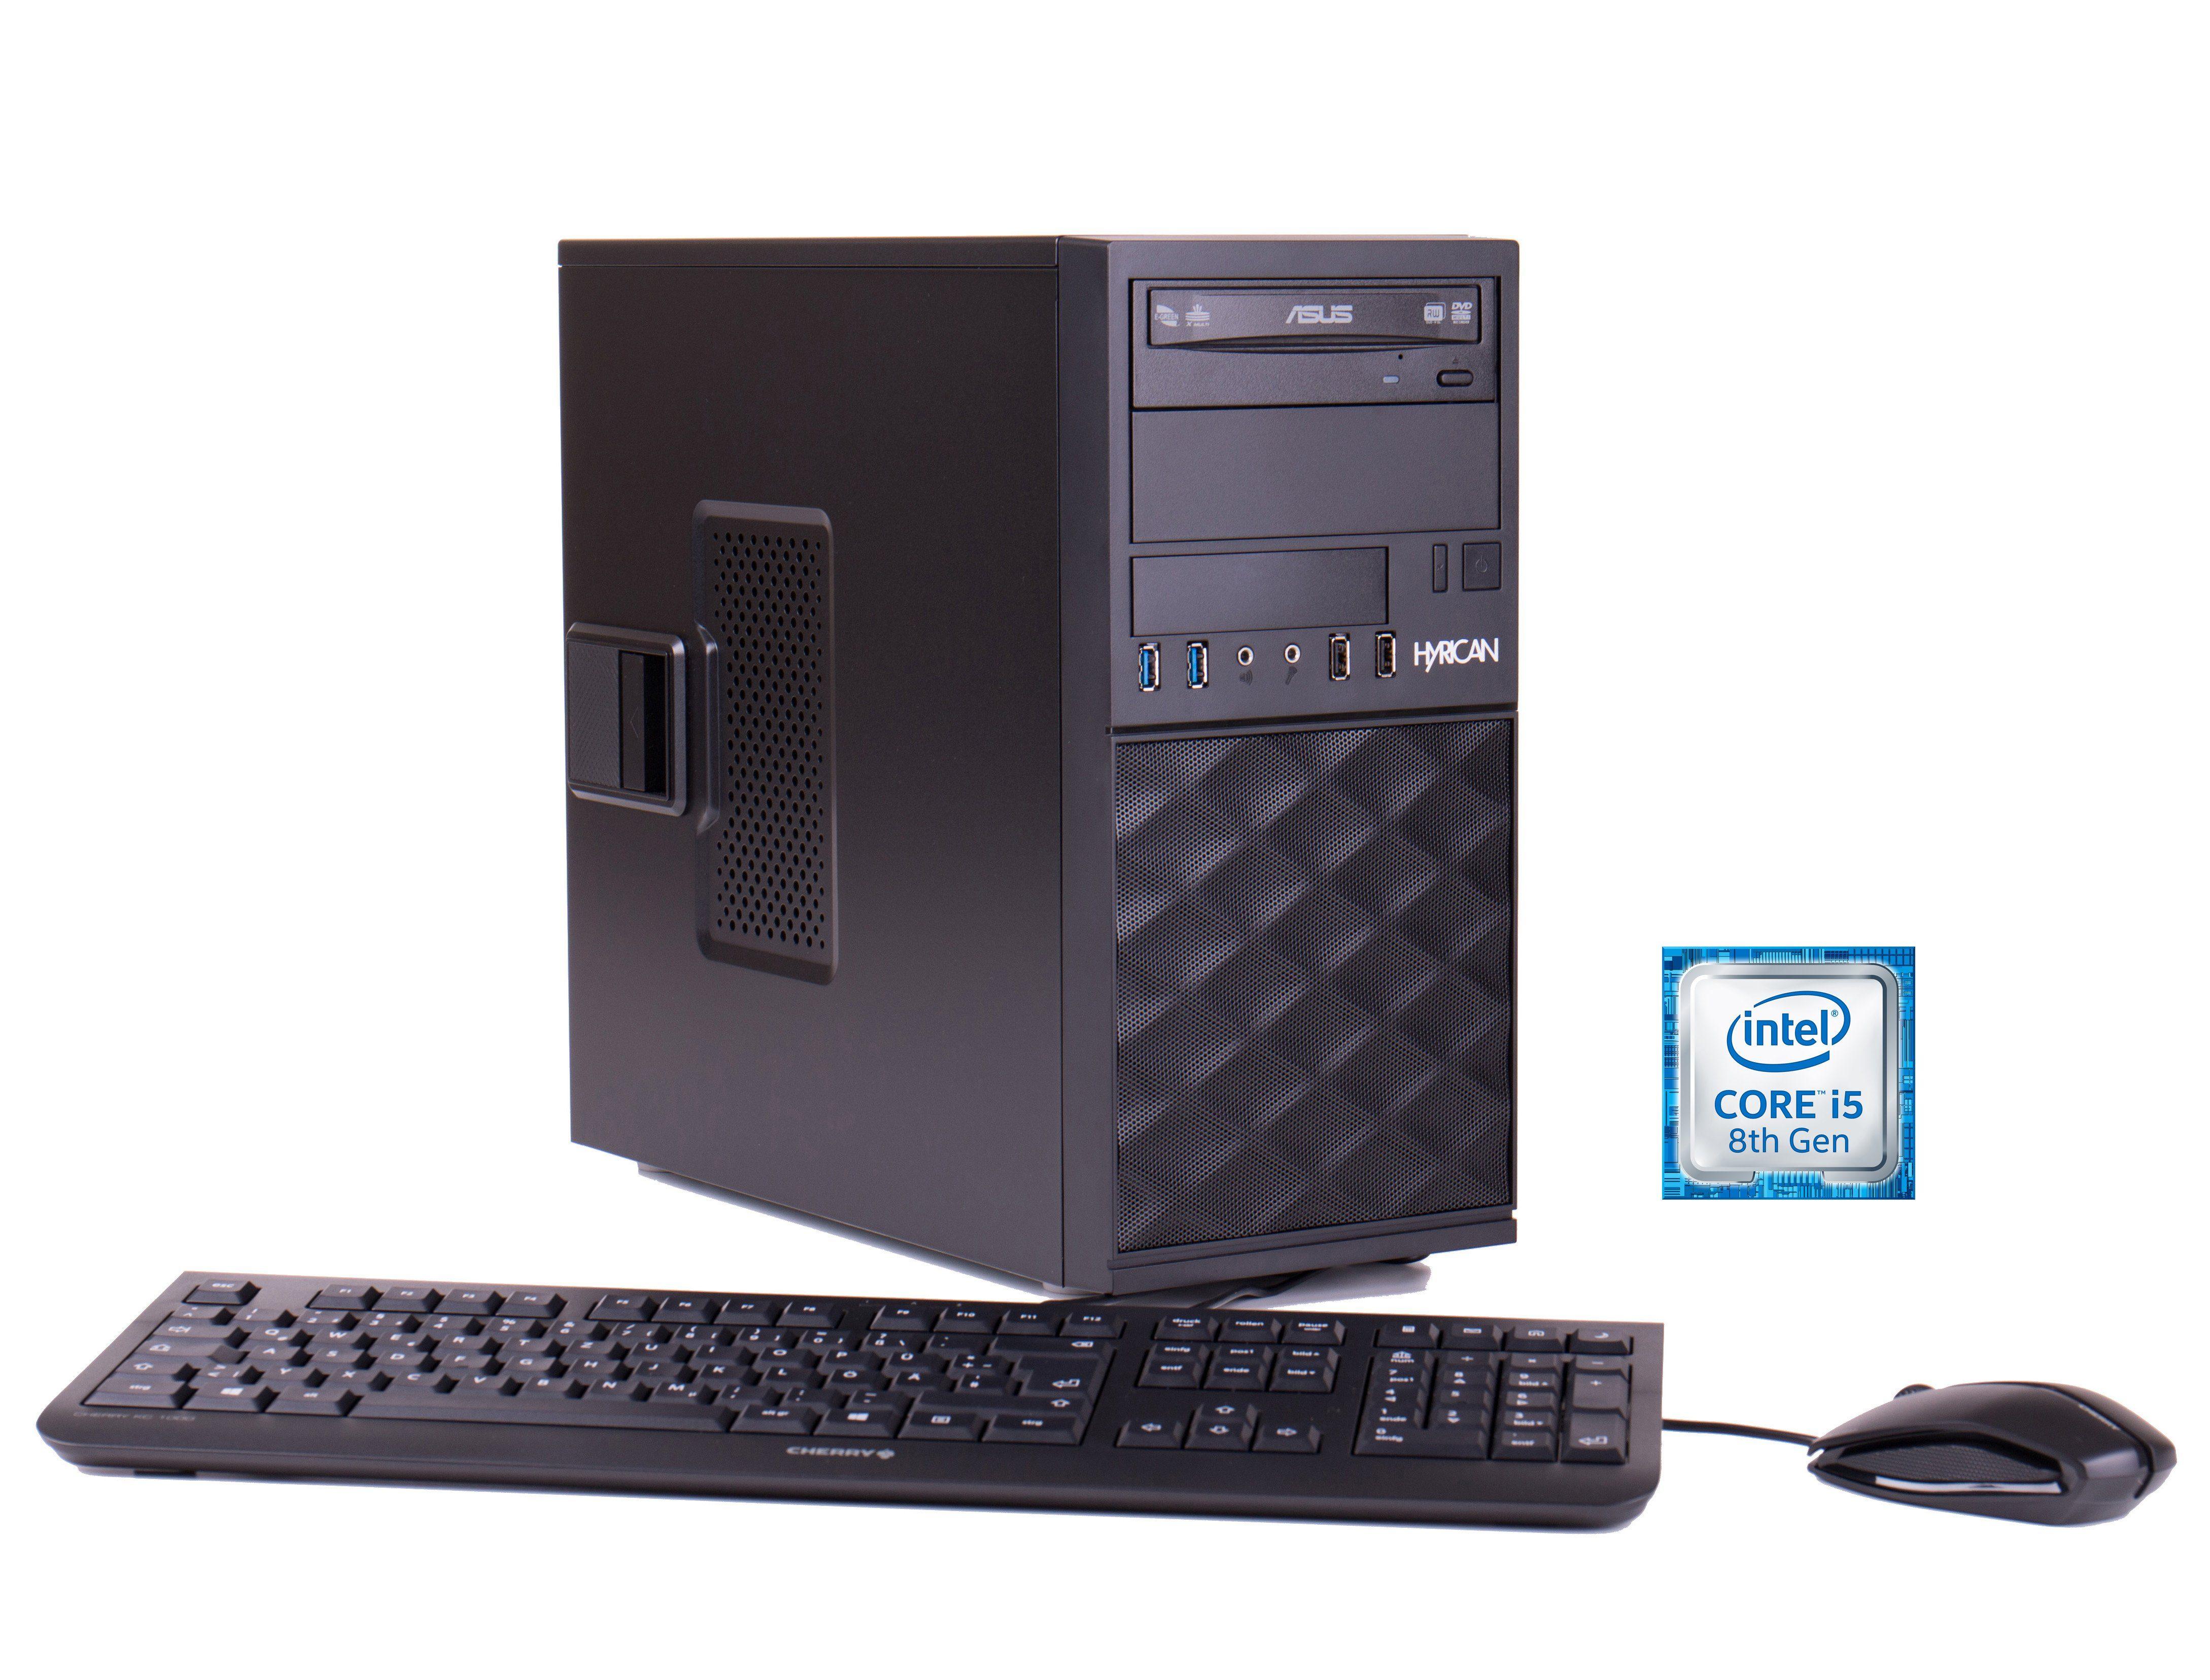 HYRICAN ProBusiness PC i5-8400 16GB 500GB PCIe SSD GTX 1070Ti Win 10 Pro »Workstation CTS00503«